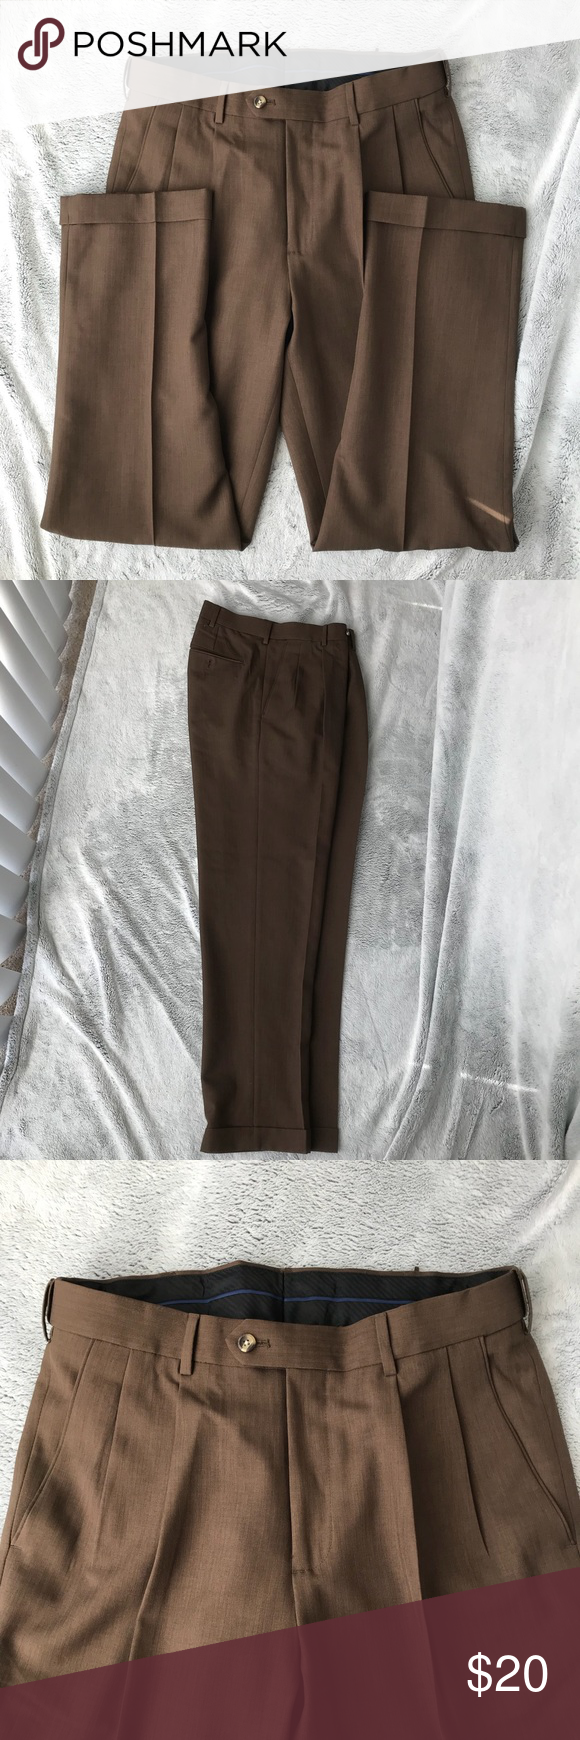 Menus dark brown dress pants